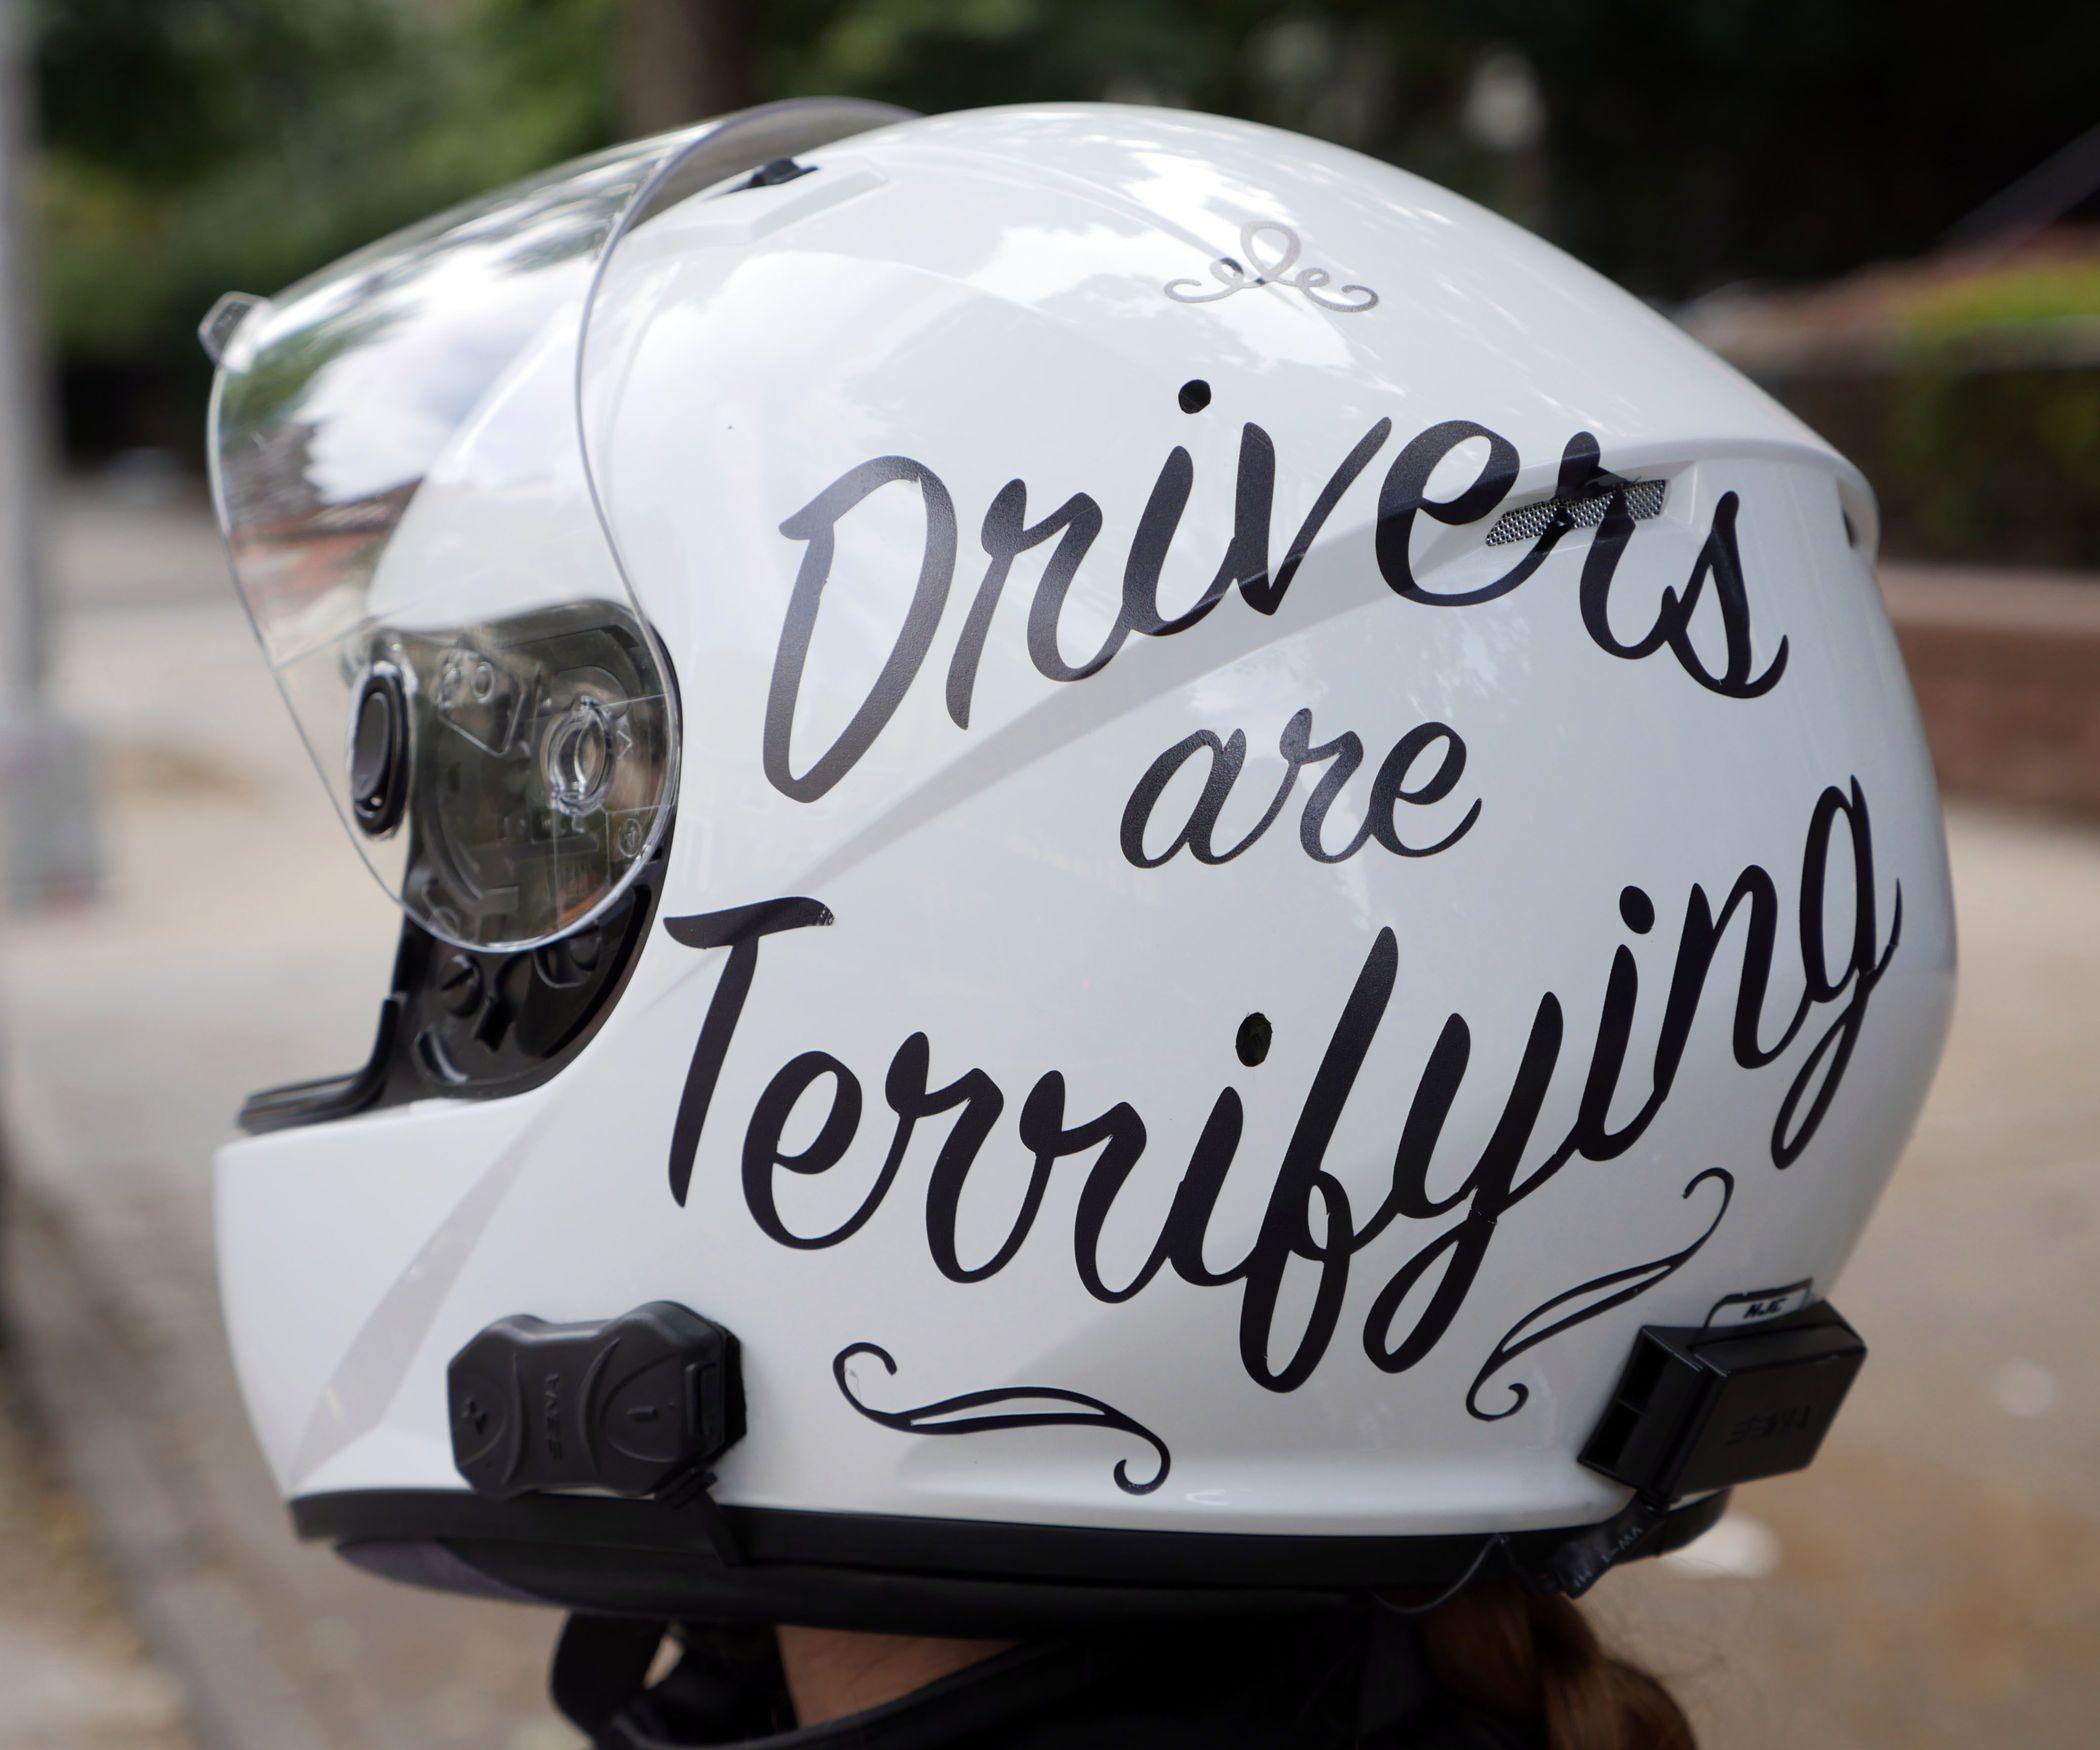 Vinyl Helmet Stickers Helmets Custom Vinyl And Craft - Custom vinyl stickers for helmets